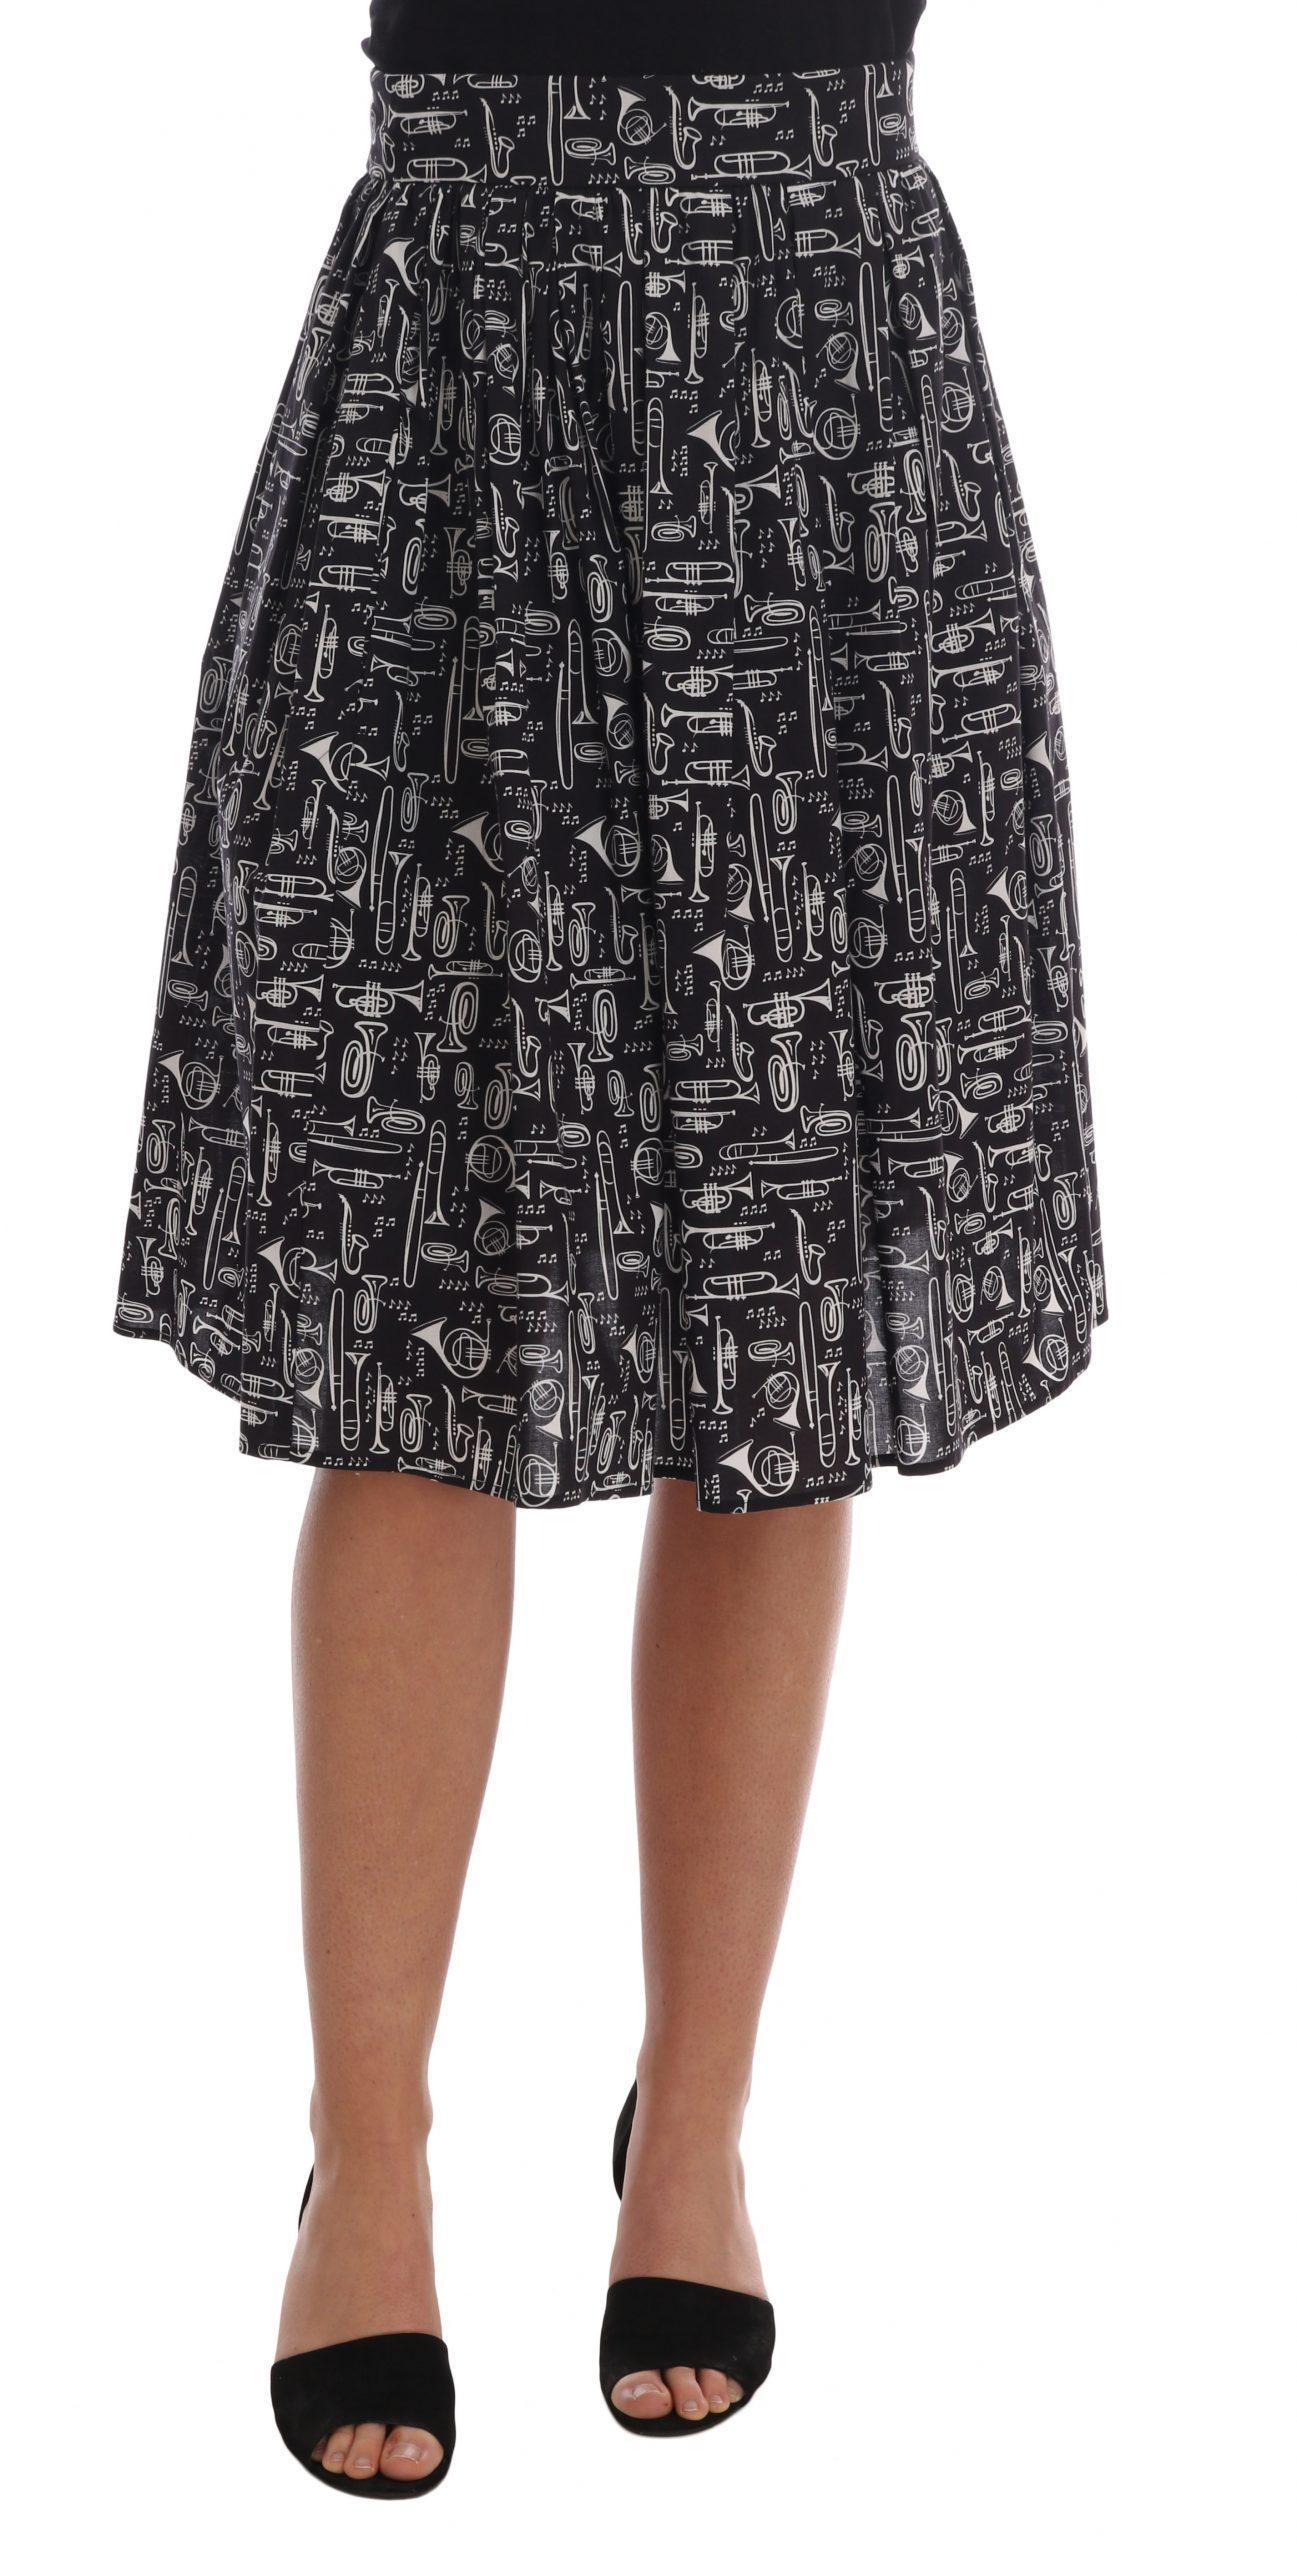 Dolce & Gabbana Women's Jazz Cotton Waist Skirt Black SKI1125 - IT40 S